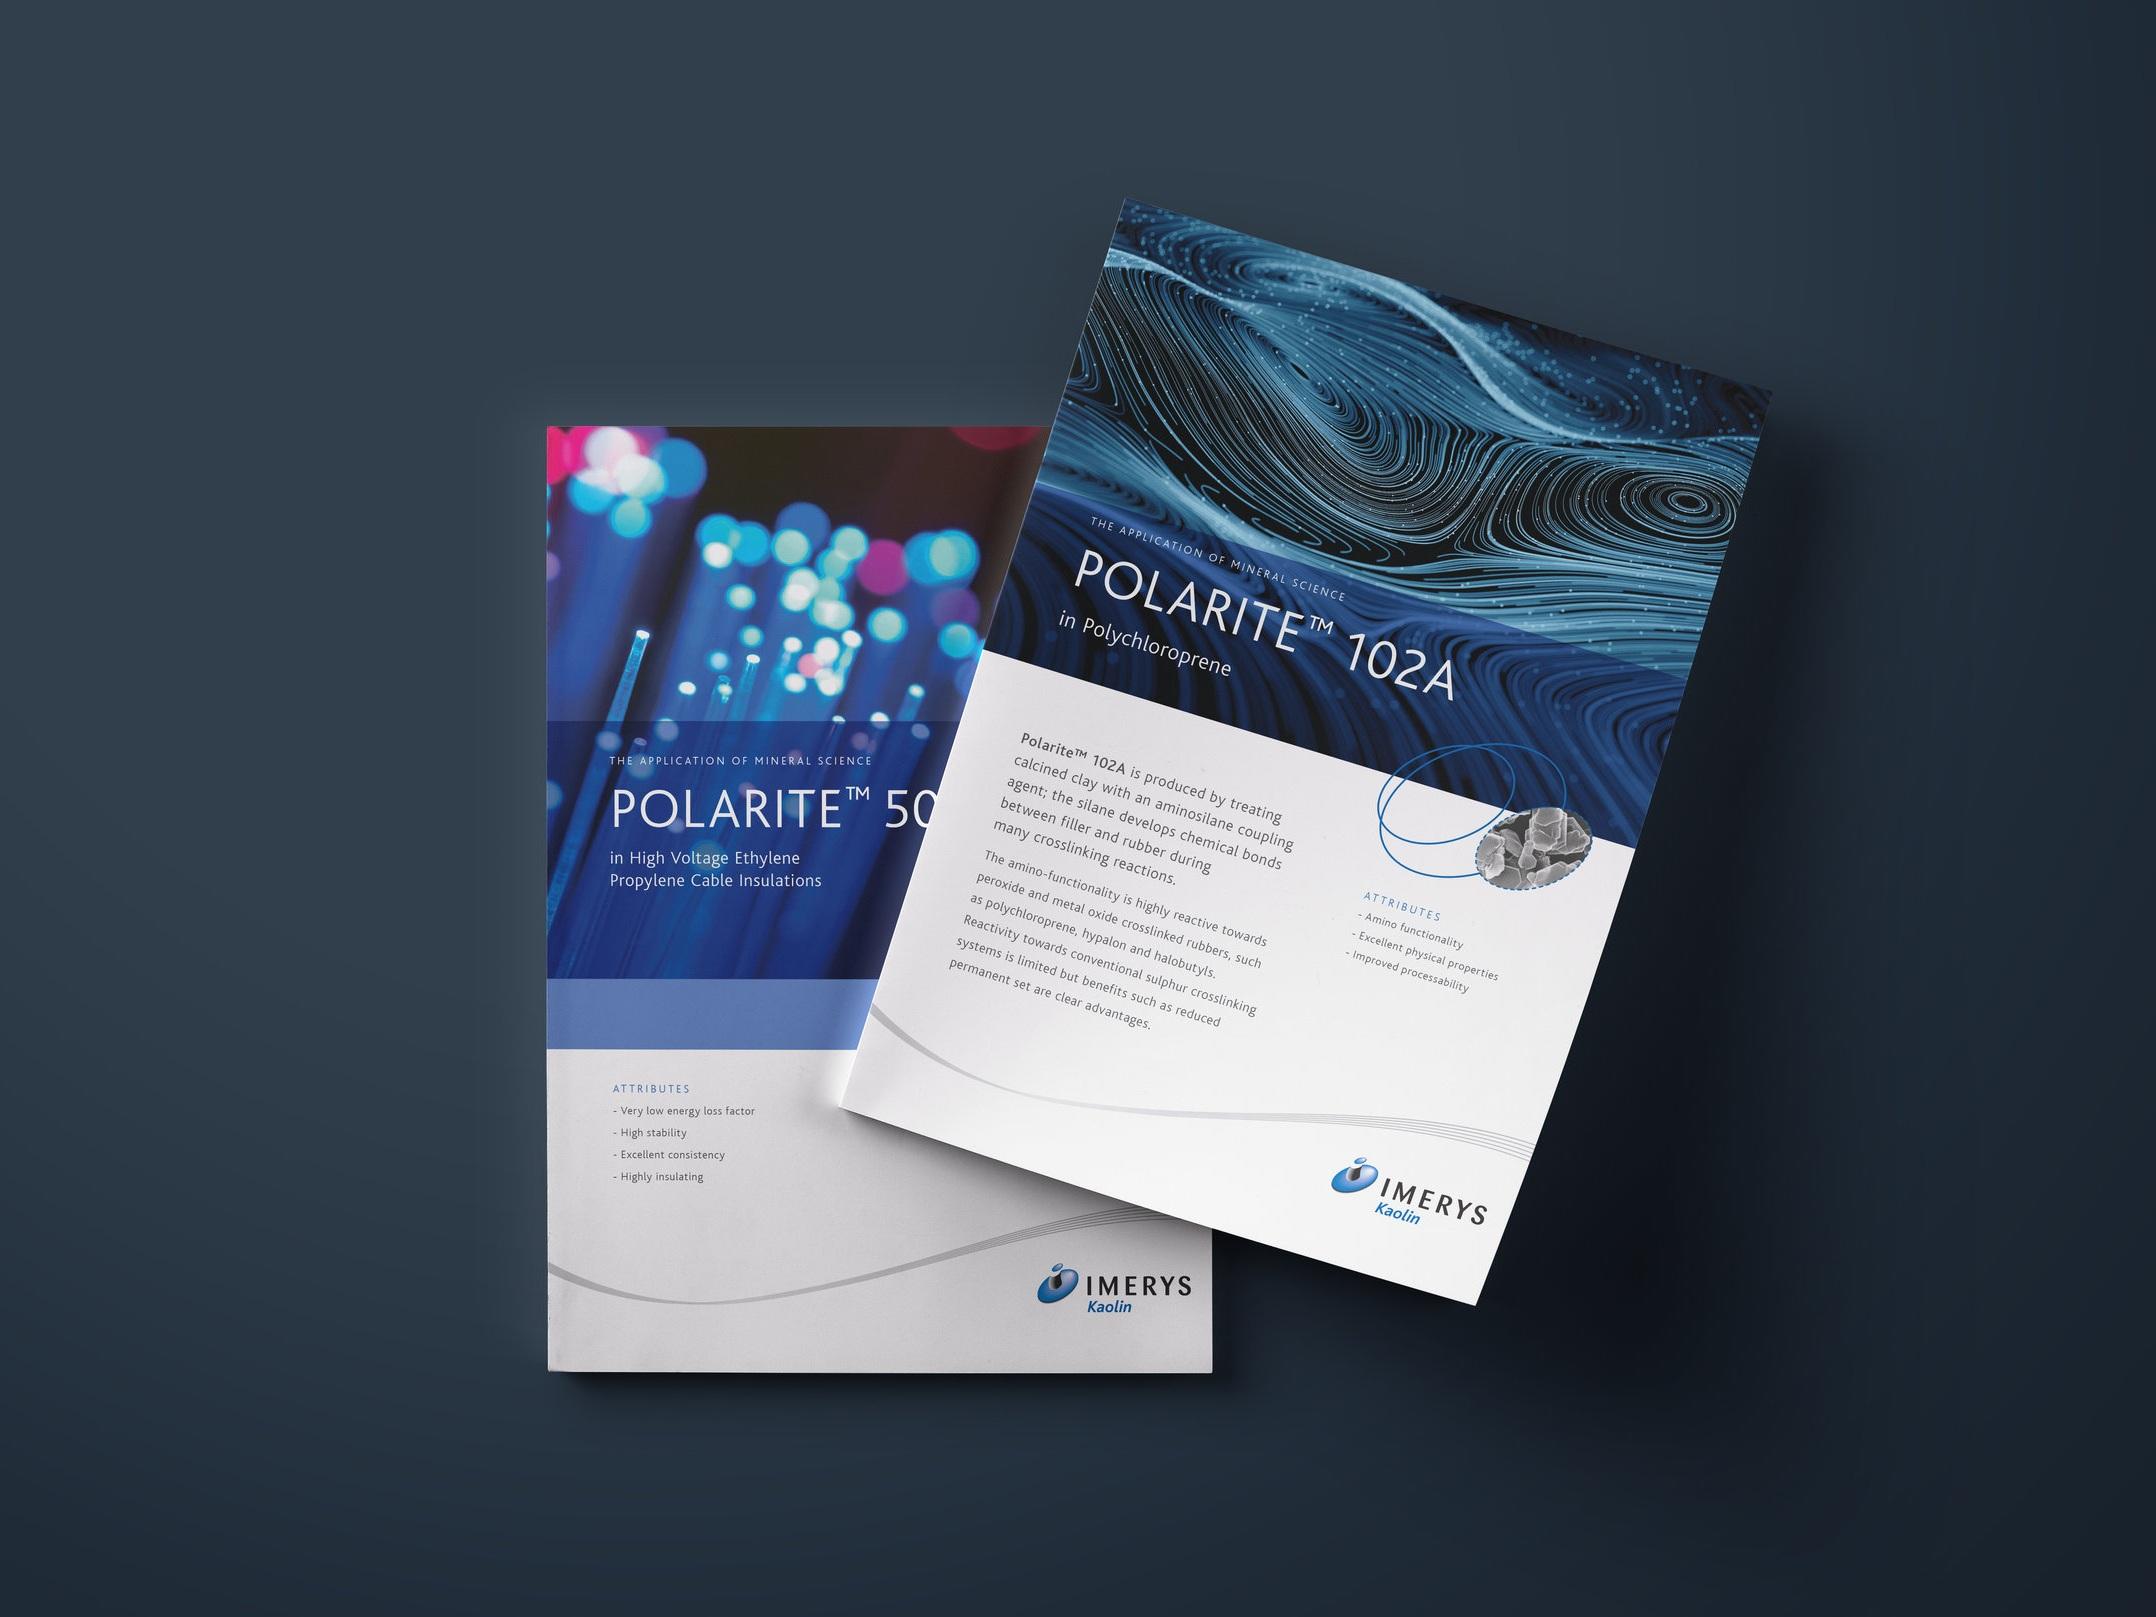 Imerys-brochures1.jpg